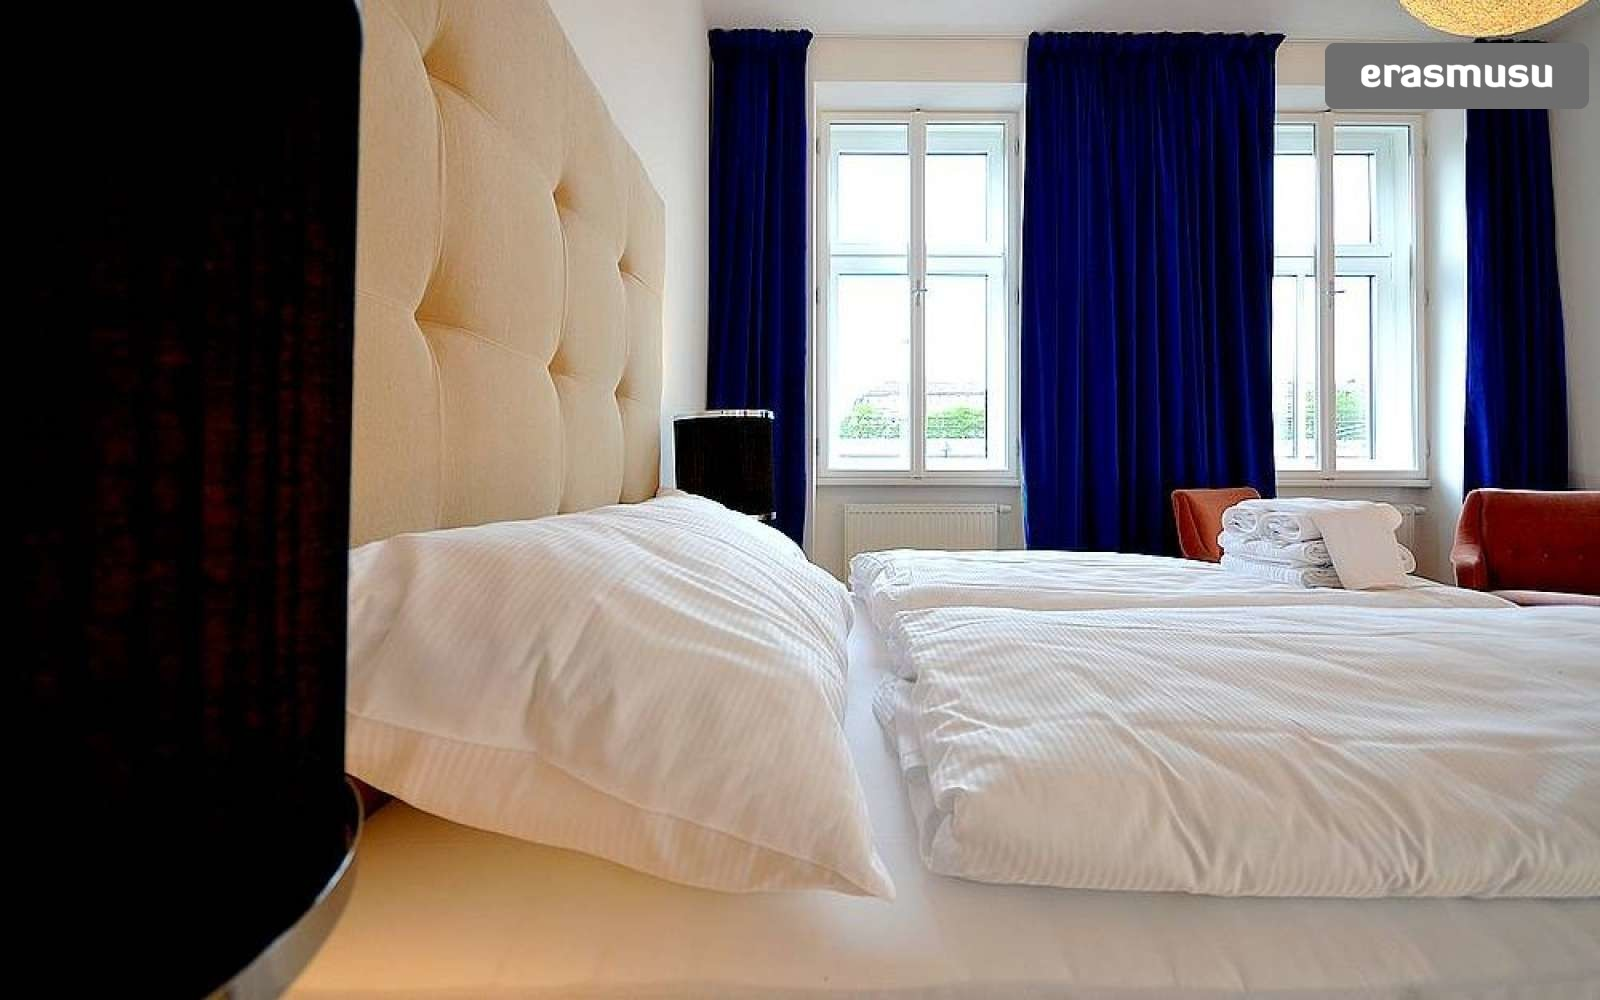 studio-apartment-rent-rudolfsheim-funfhaus-ac6a03defd80b368184e0